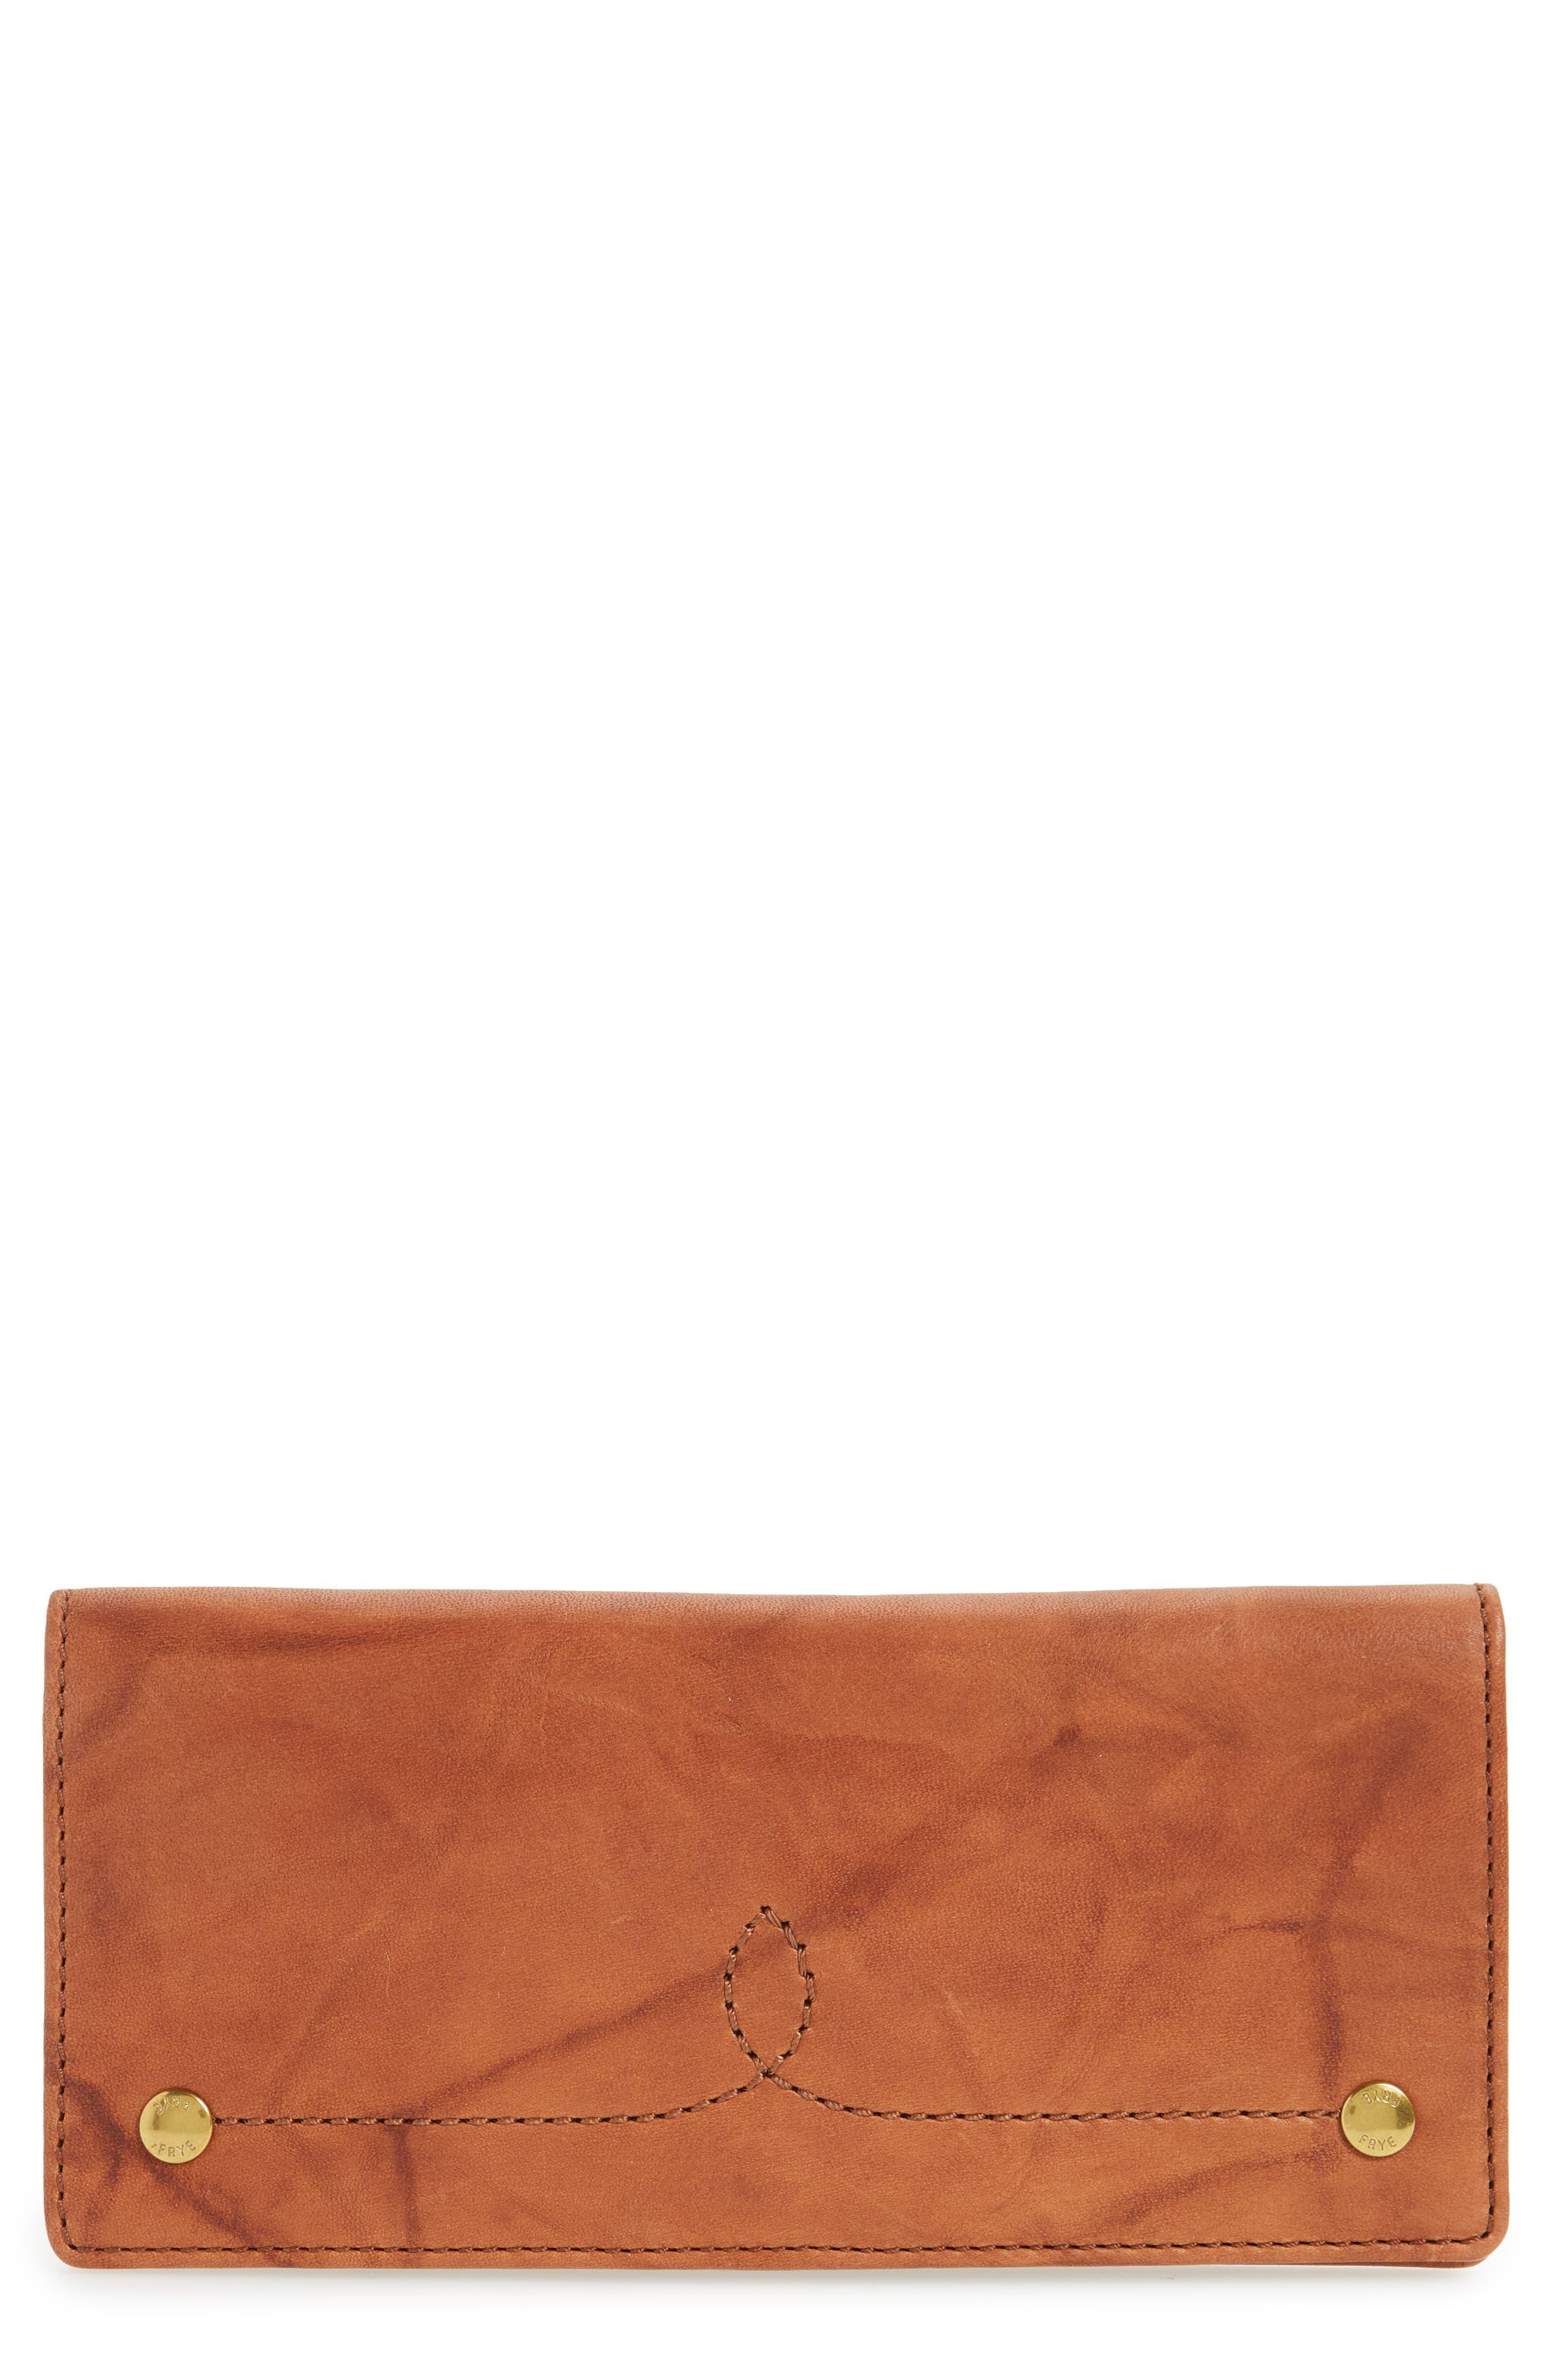 Campus Rivet Slim Leather Wallet,                             Main thumbnail 1, color,                             Saddle